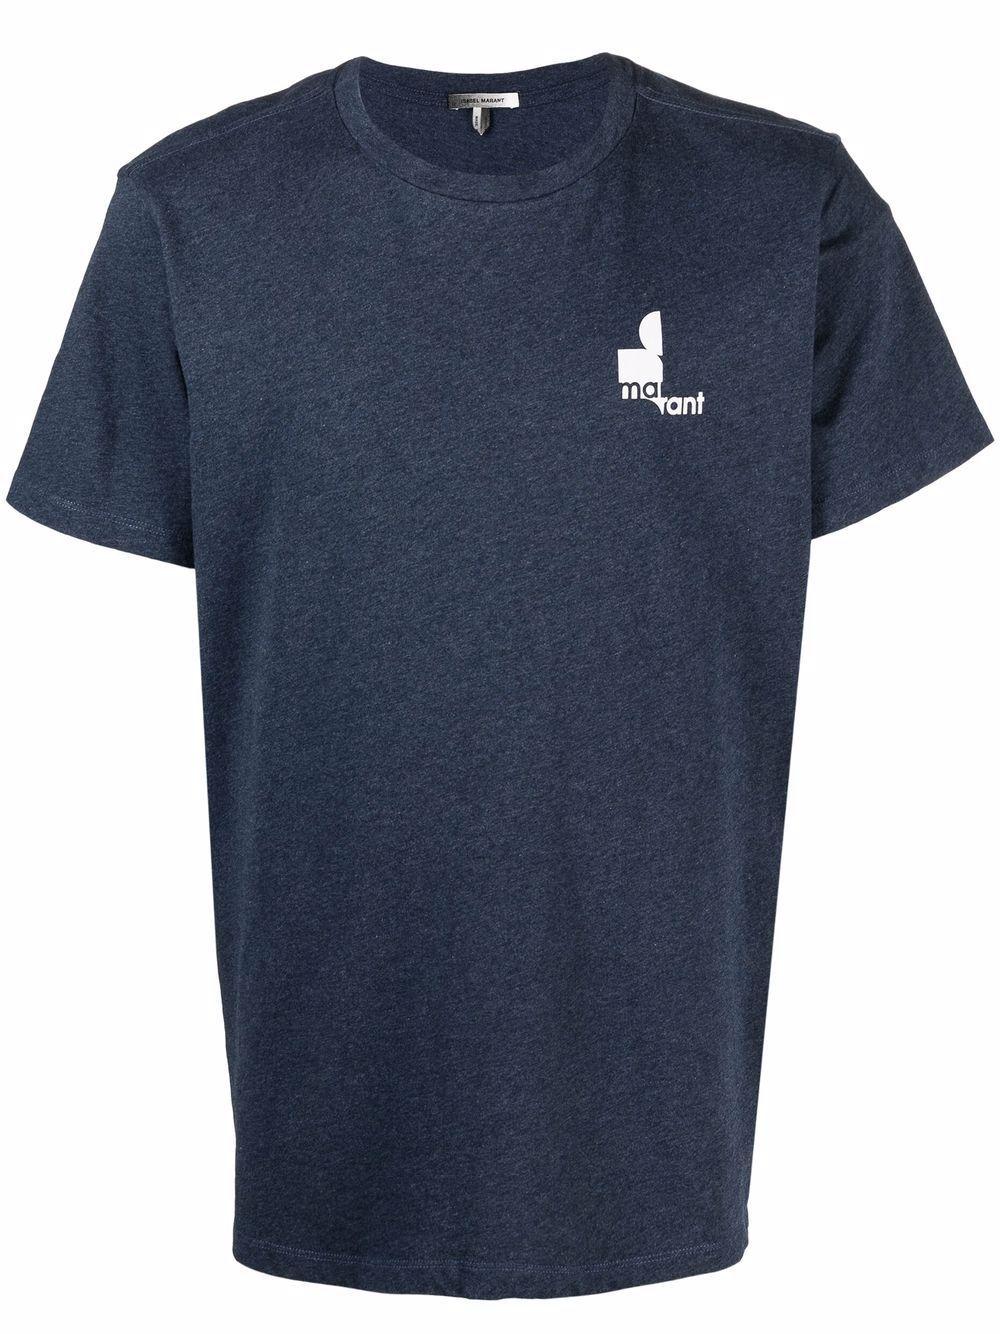 Isabel marant t-shirt e polo blu